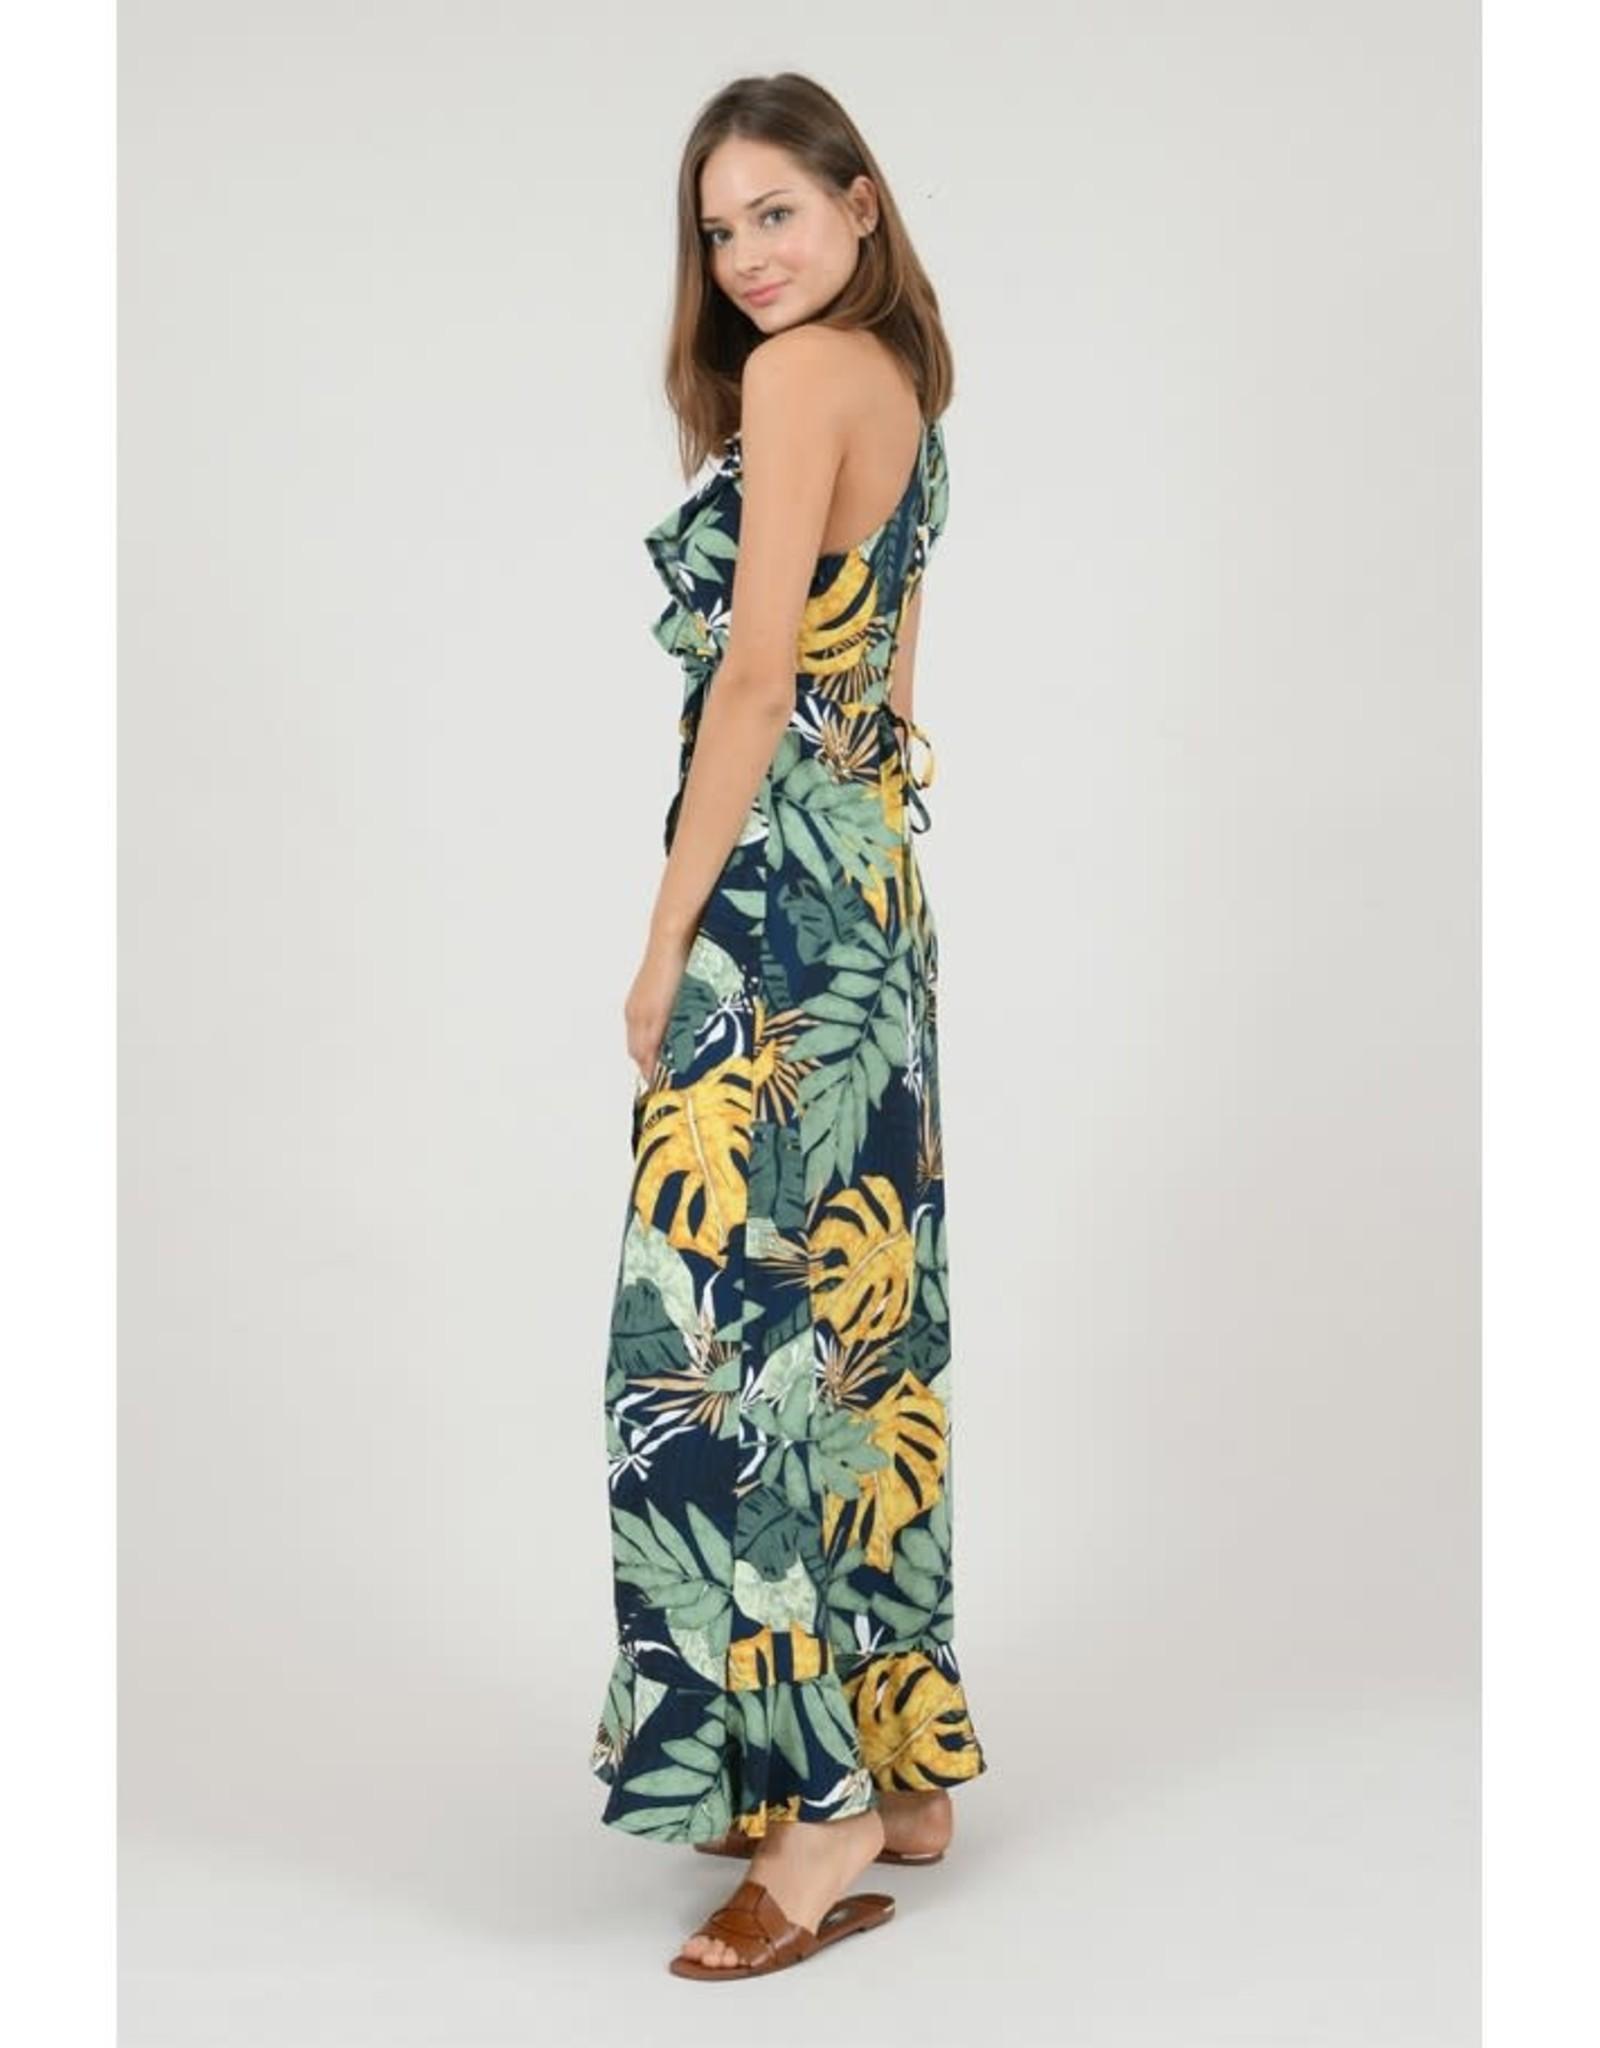 Molly Bracken Woven dress (tropical navy)